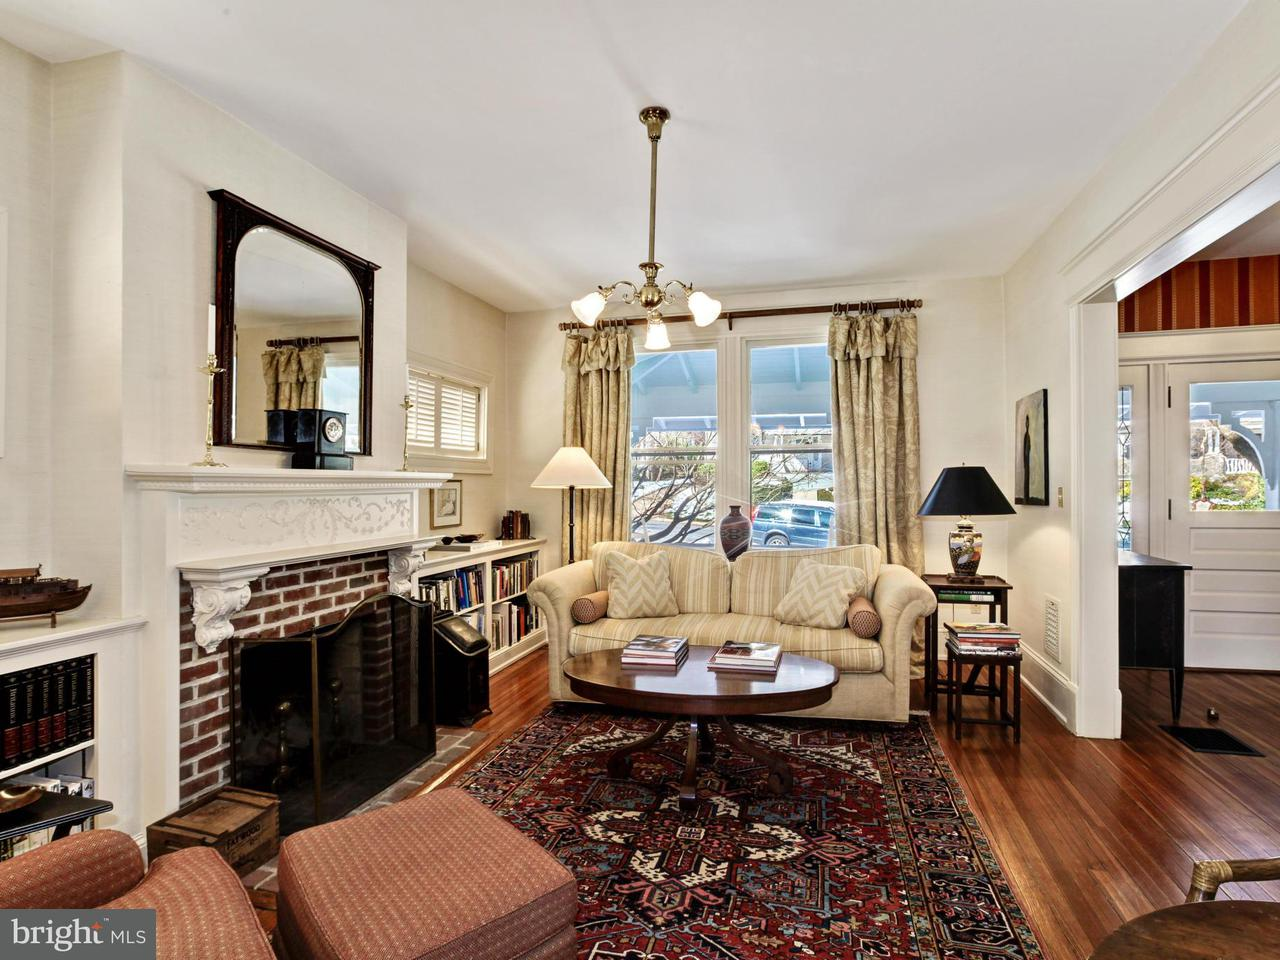 Additional photo for property listing at 2946 NEWARK ST NW 2946 NEWARK ST NW Washington, Περιφερεια Τησ Κολουμπια 20008 Ηνωμενεσ Πολιτειεσ